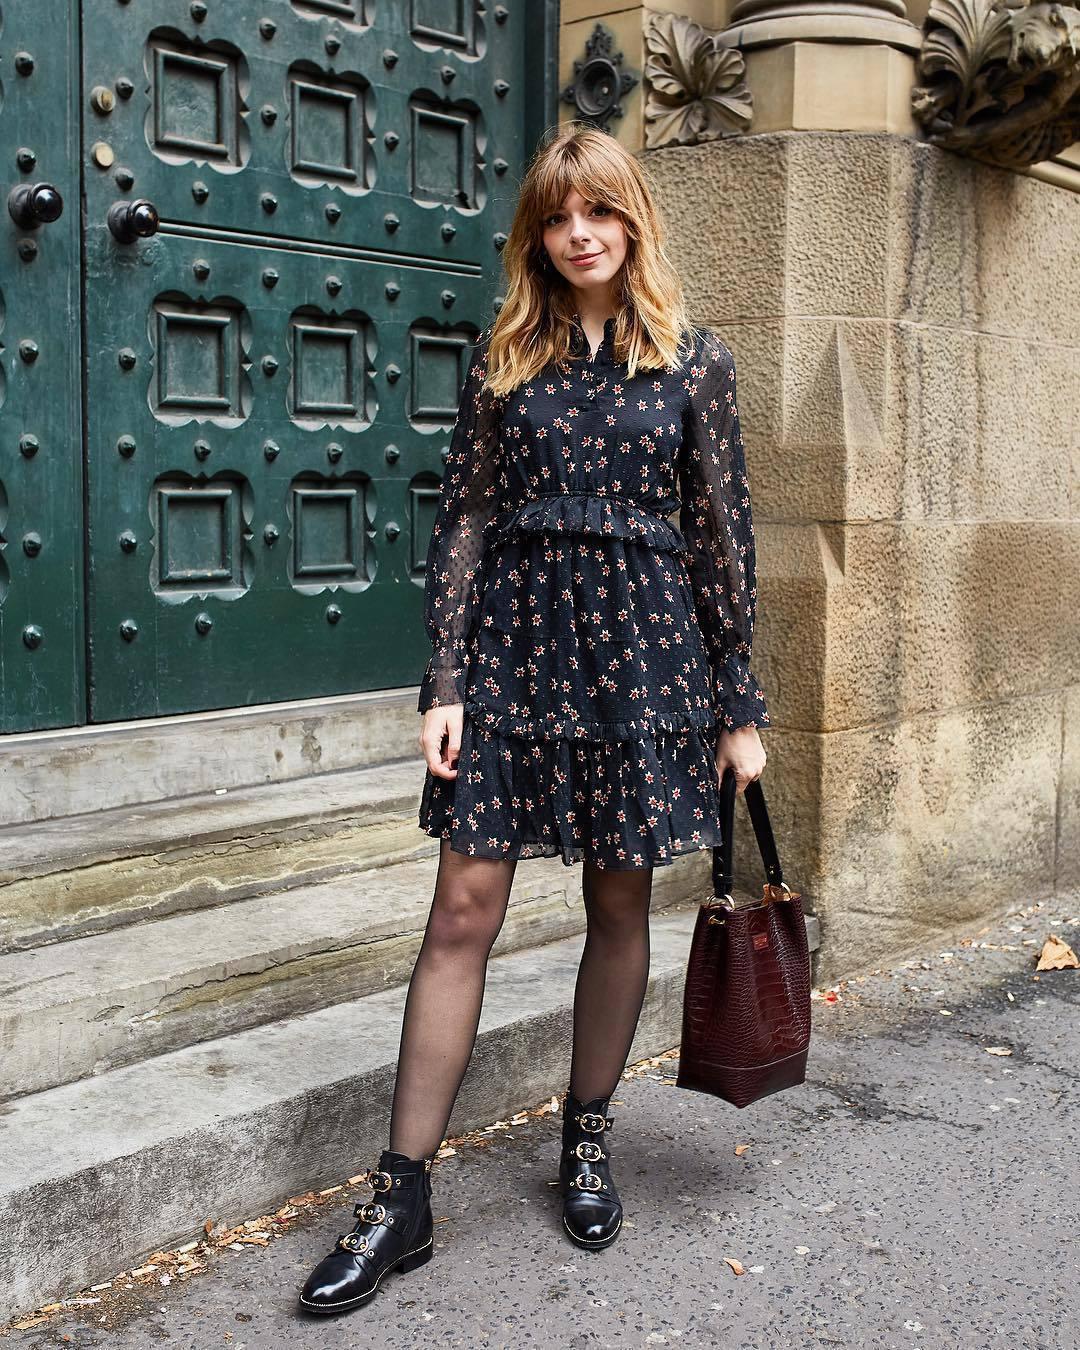 dress floral dress layered mini dress black boots ankle boots shoulder bag tights